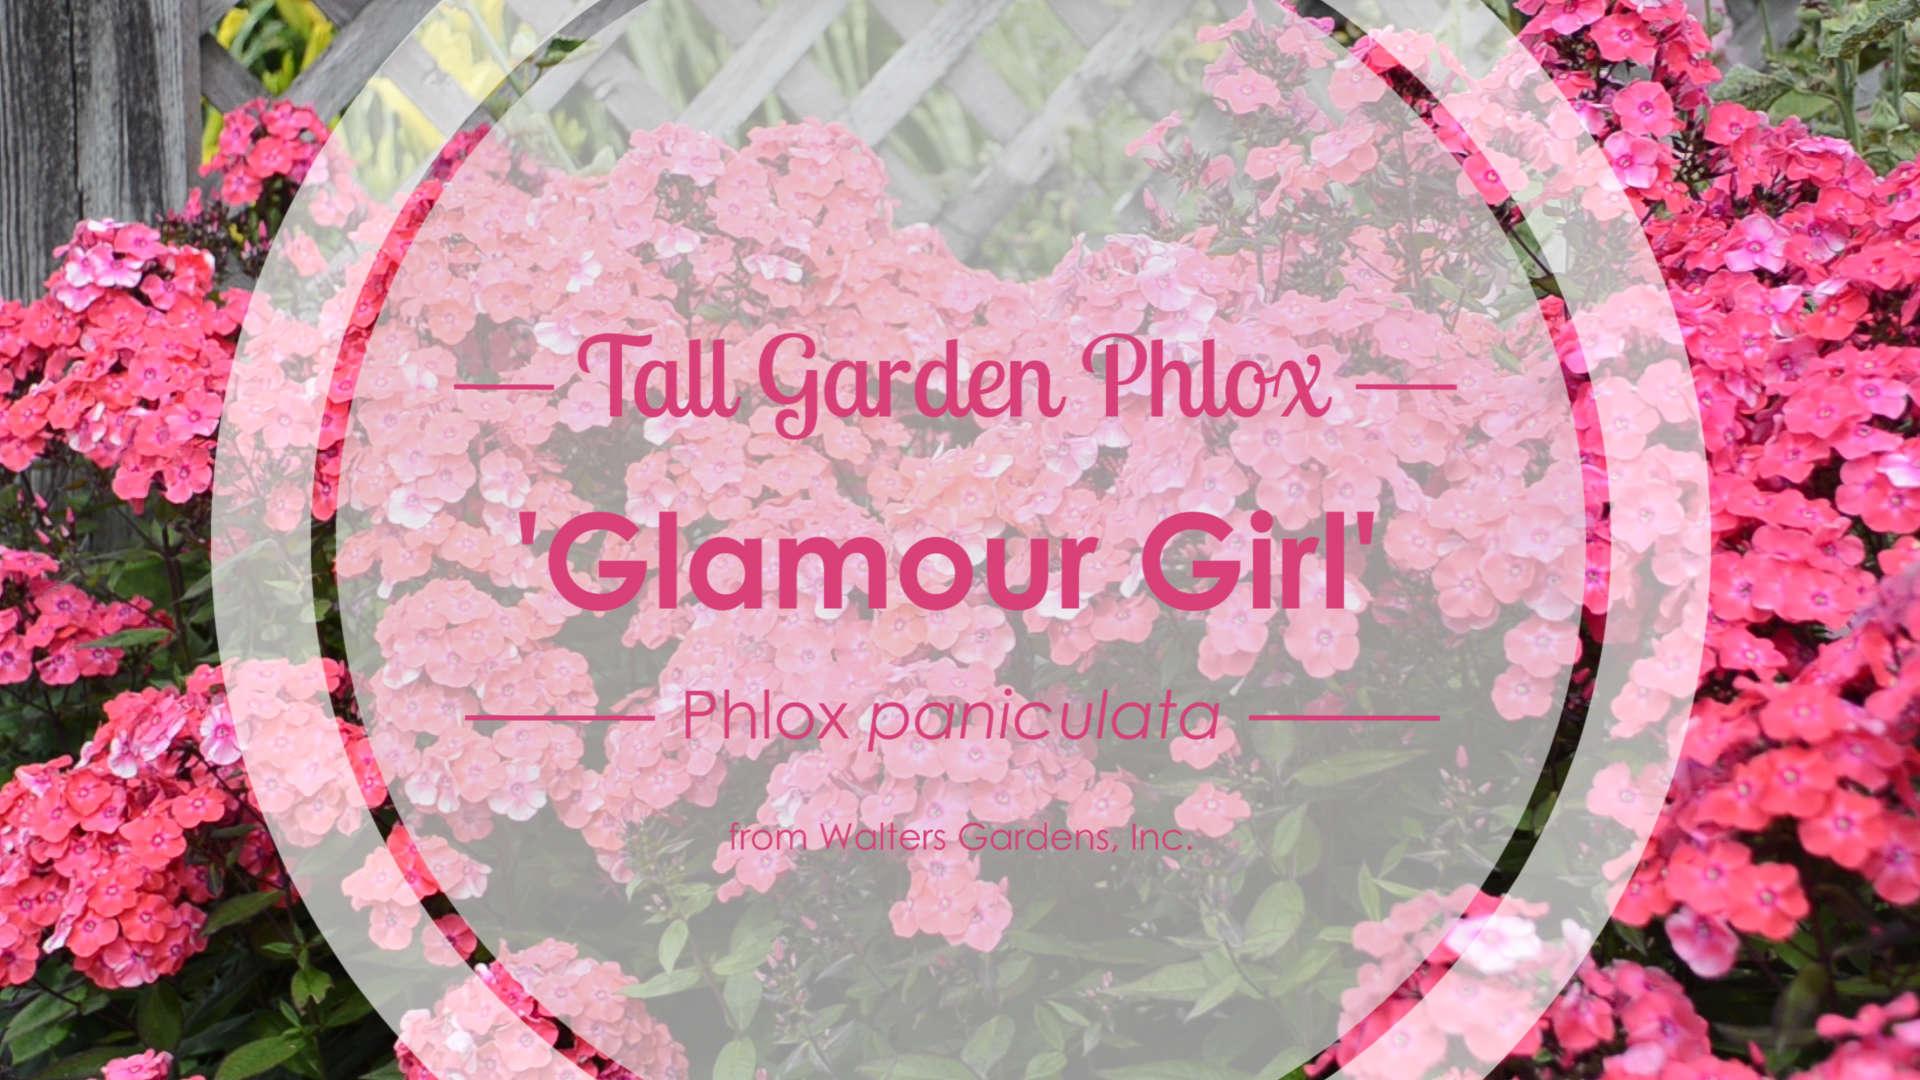 Phlox 'Glamour Girl' Tall Garden Phlox